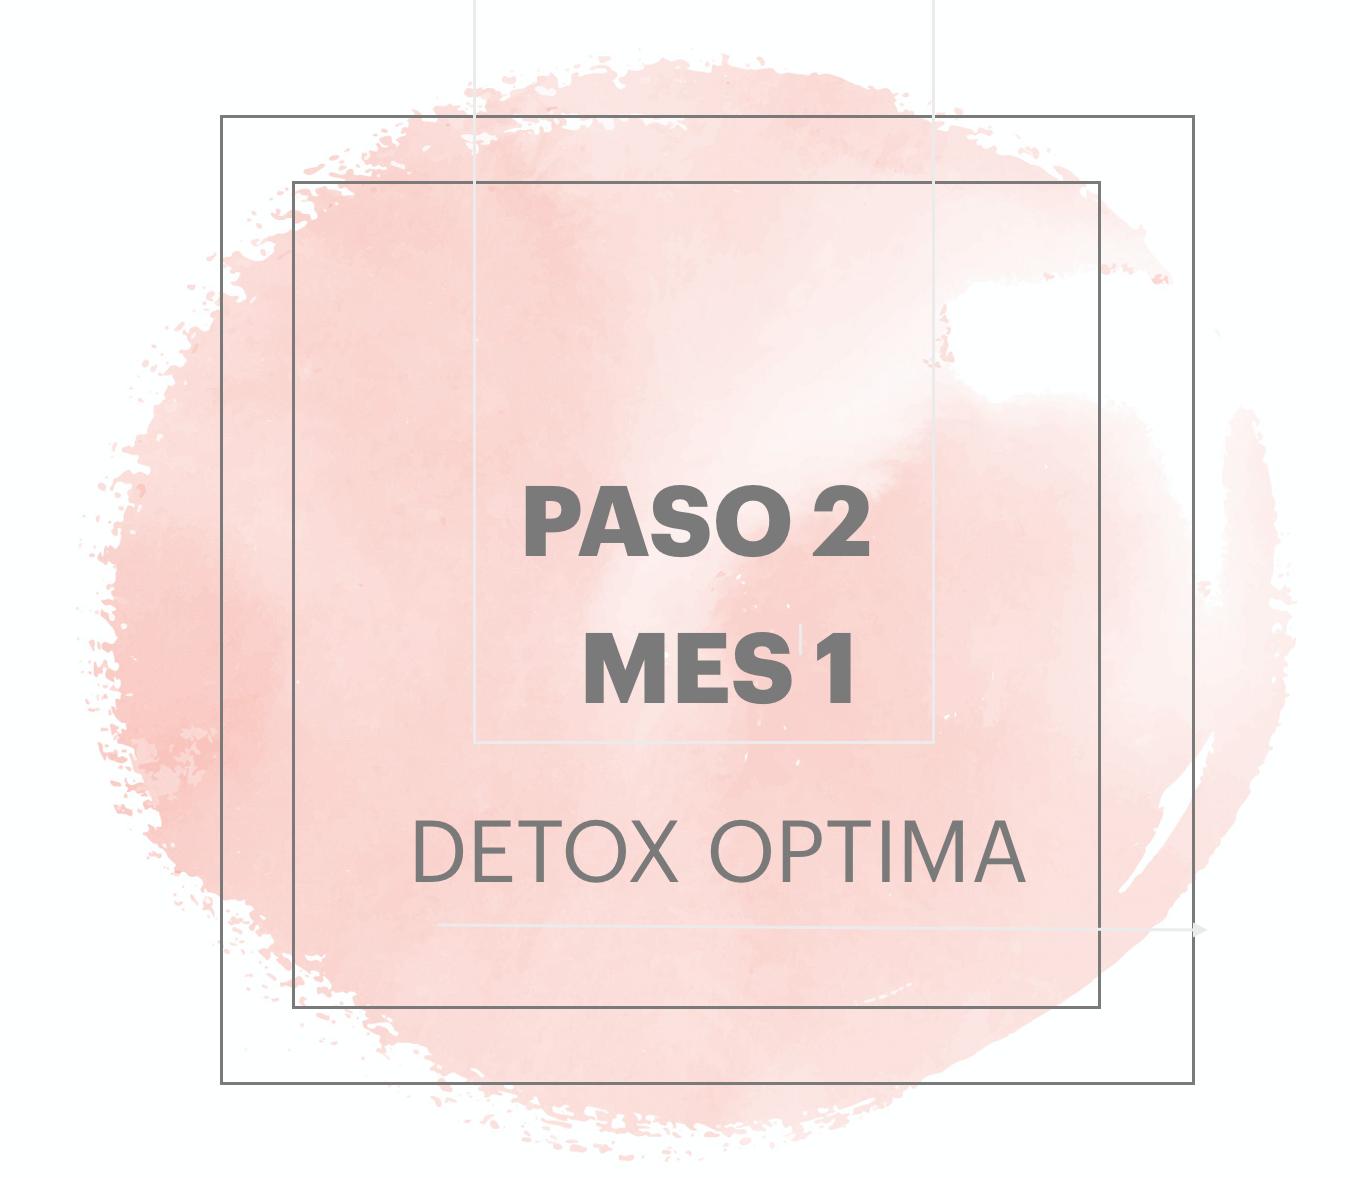 PASO 2 | MES 1 CAND Optima